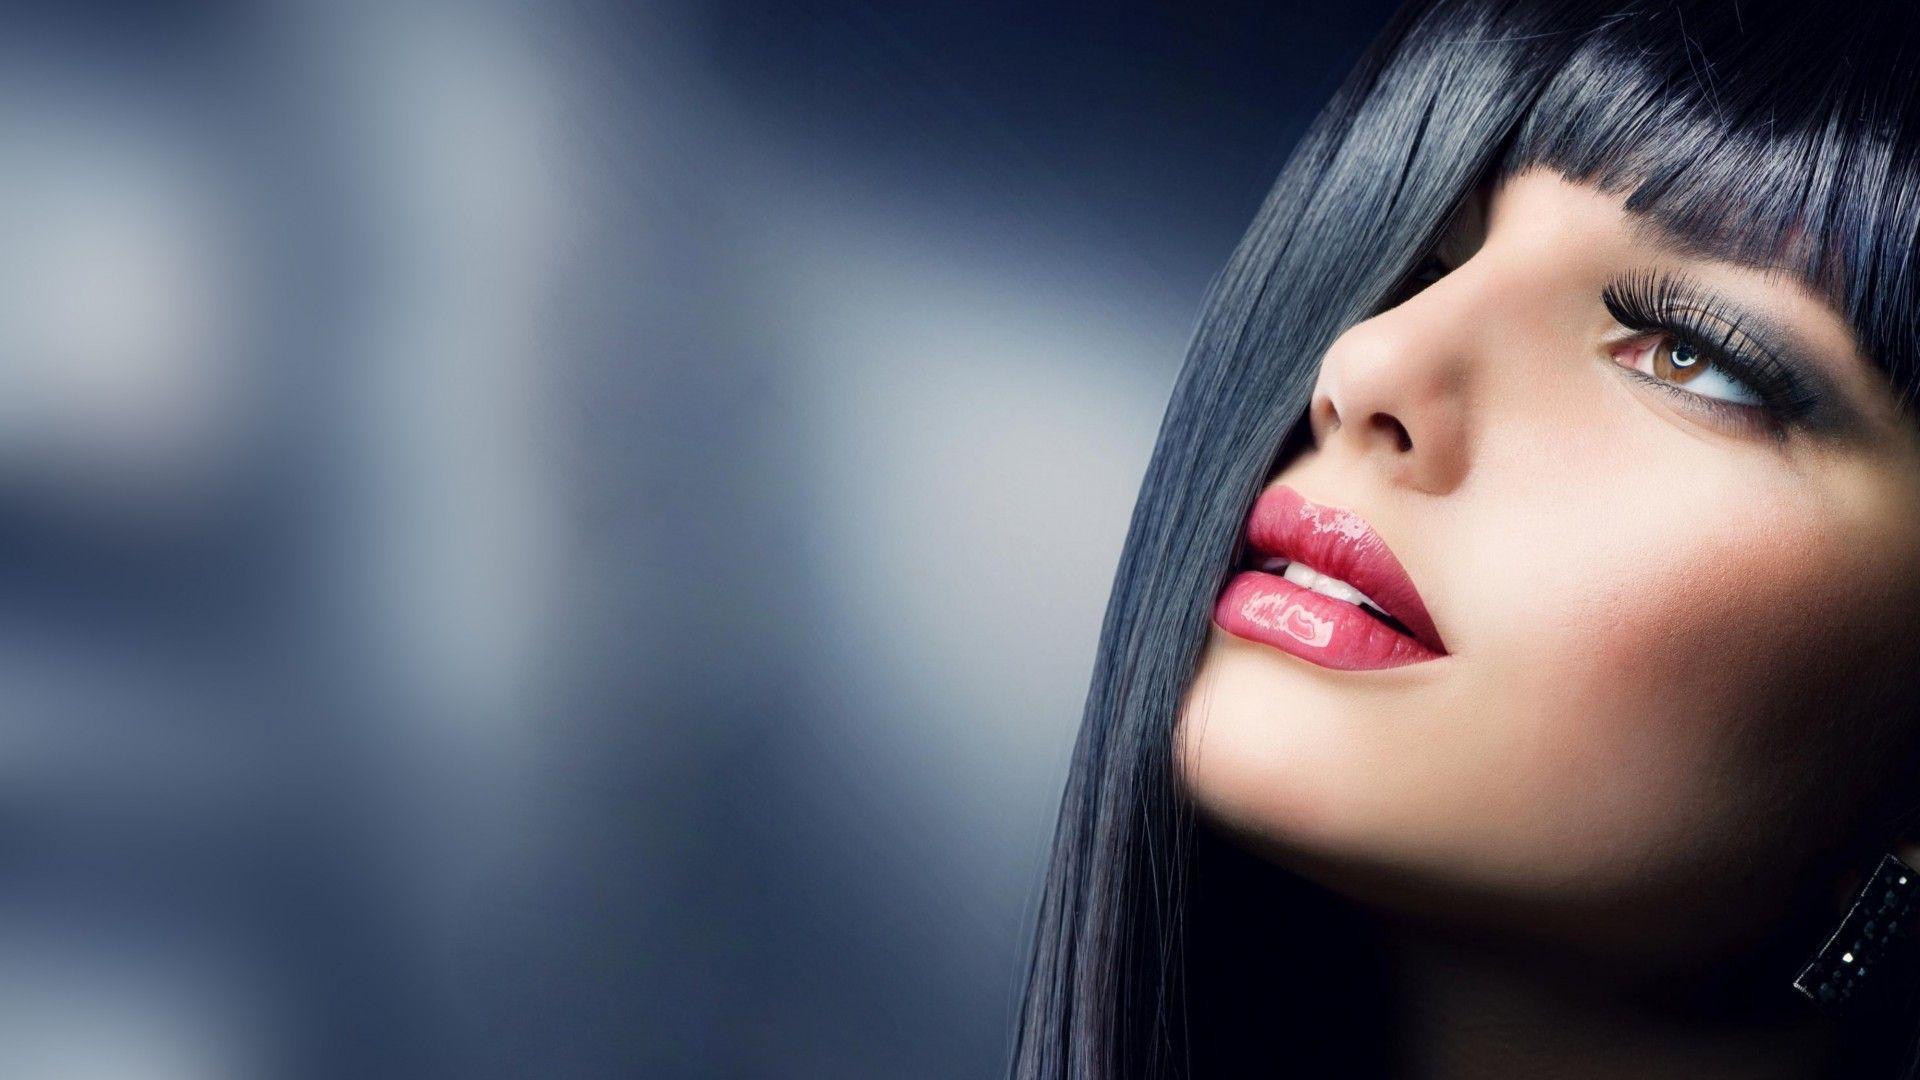 Wallpaper - Interior Wall Decor Wallcoverings | Best Price ...  |Beauty Salon Wallpaper Designs